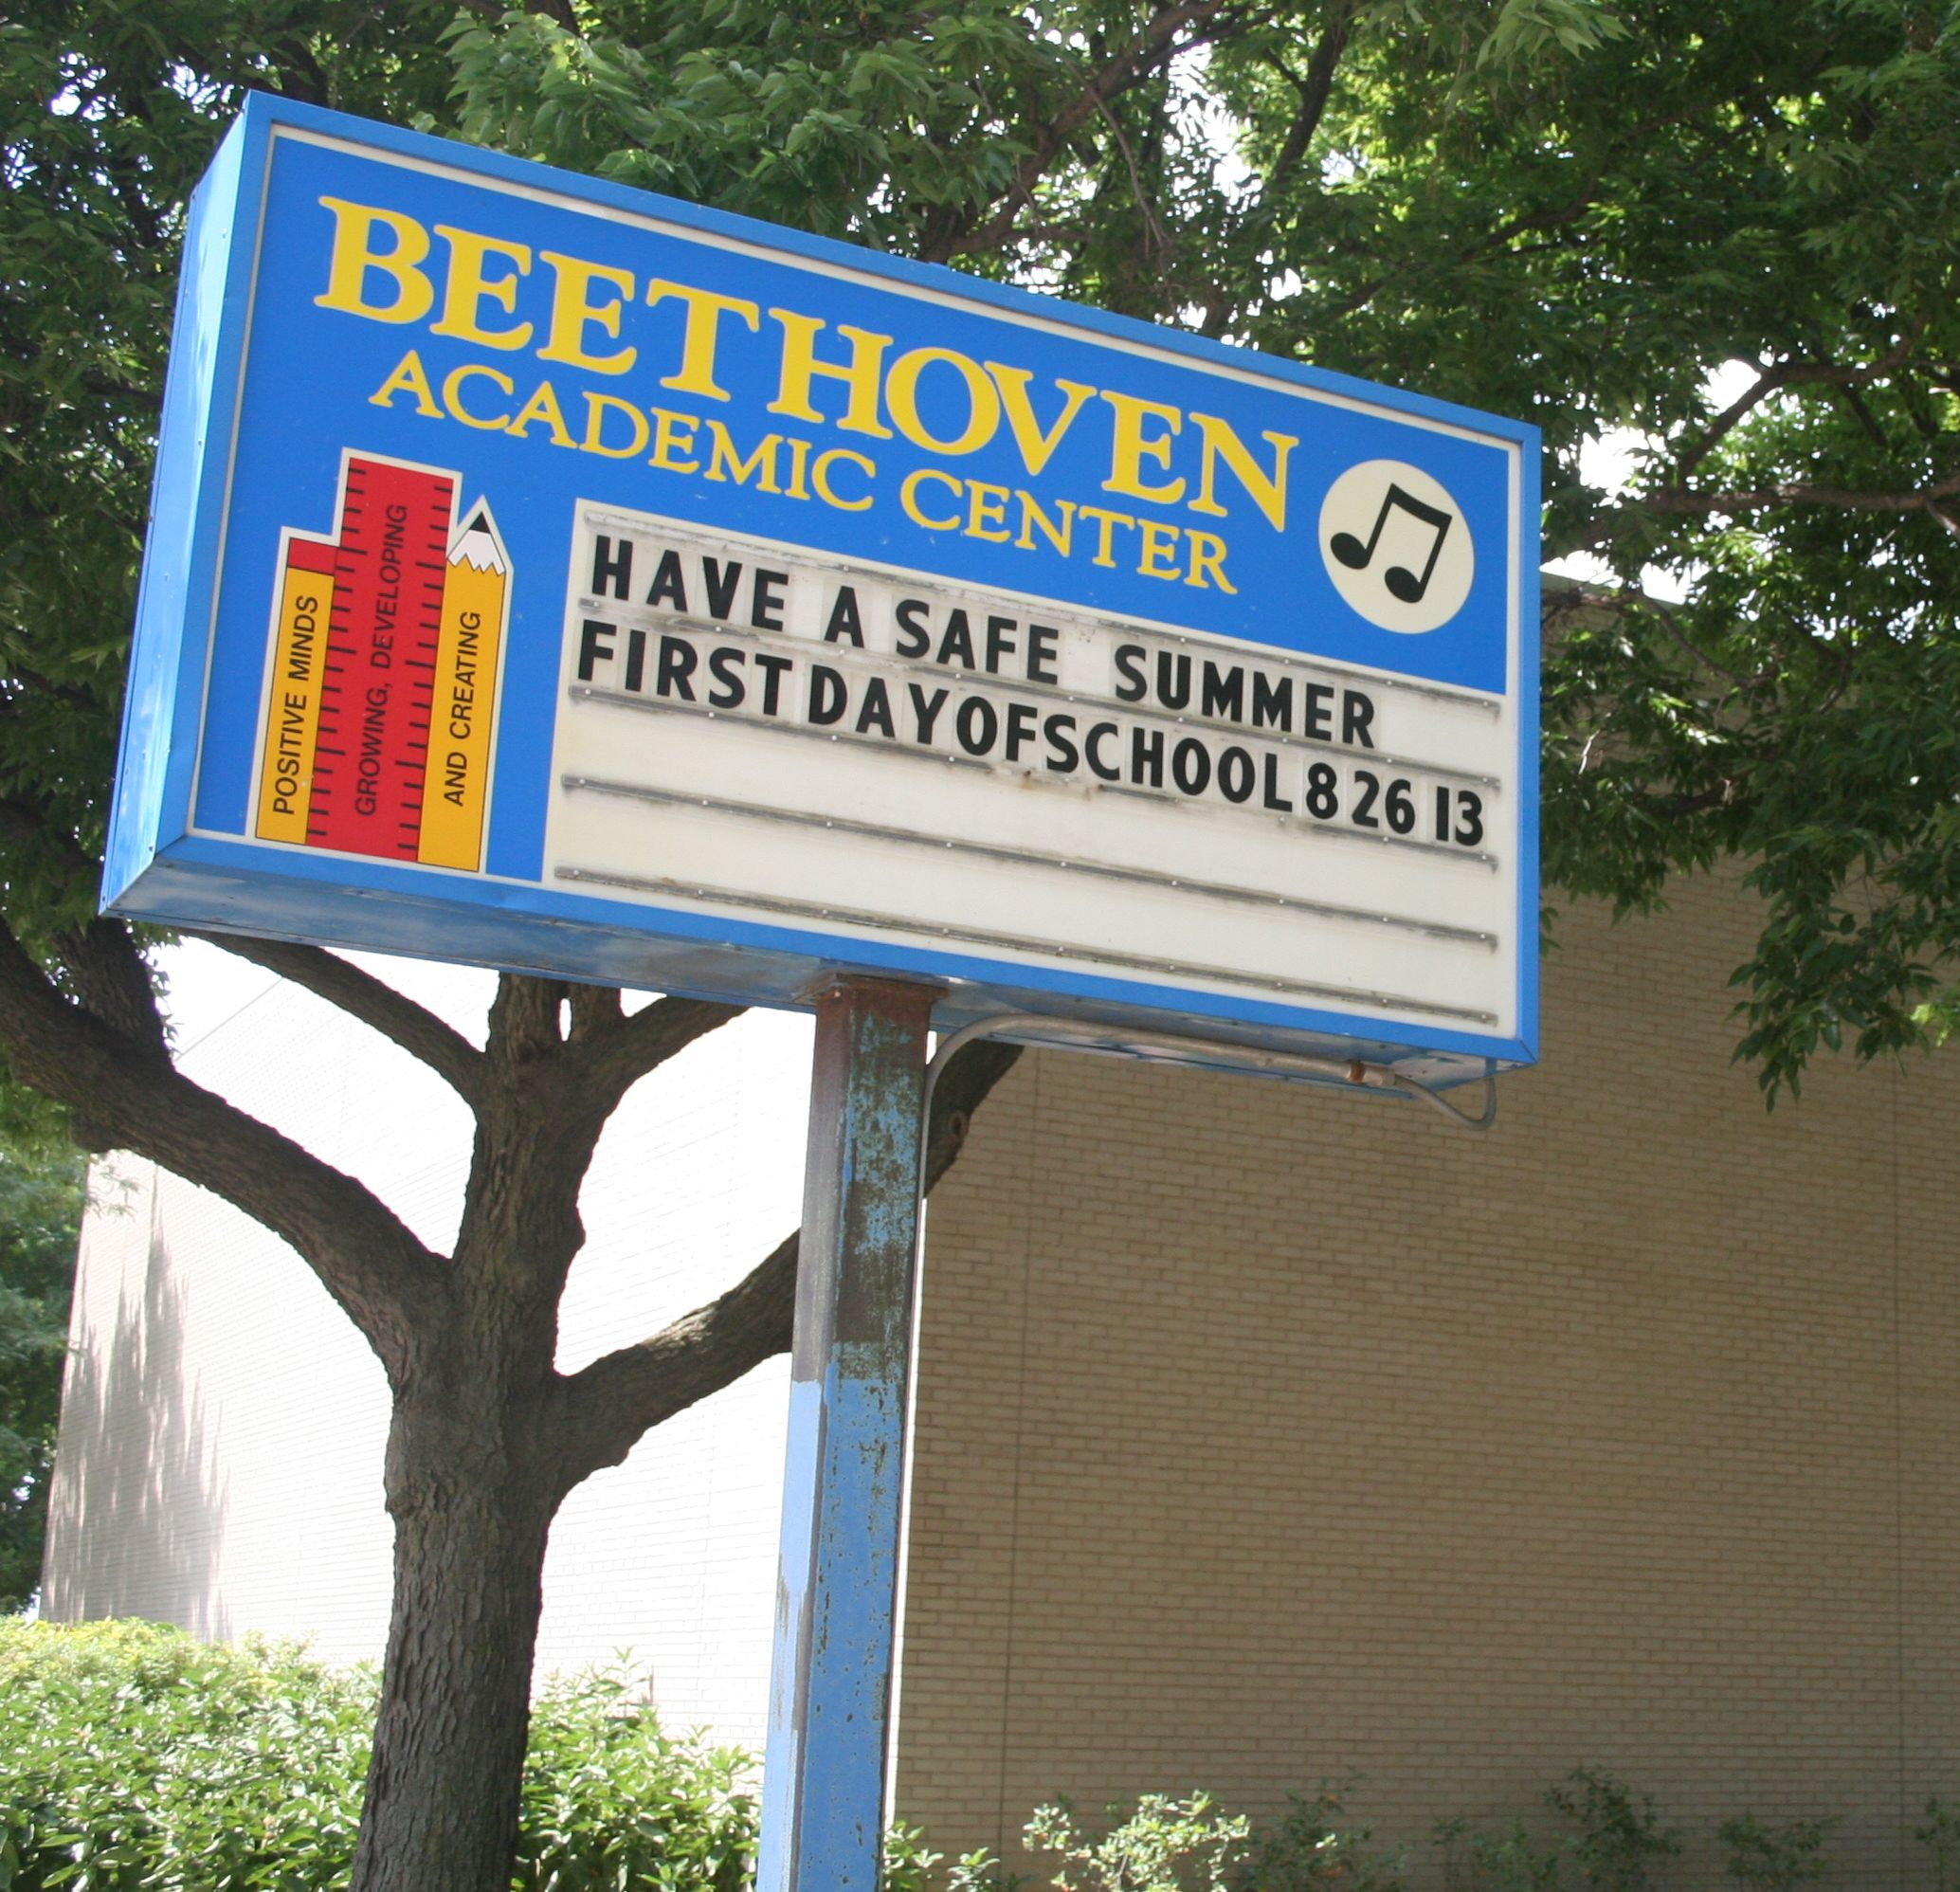 featured image Ludwig Van Beethoven Elementary School